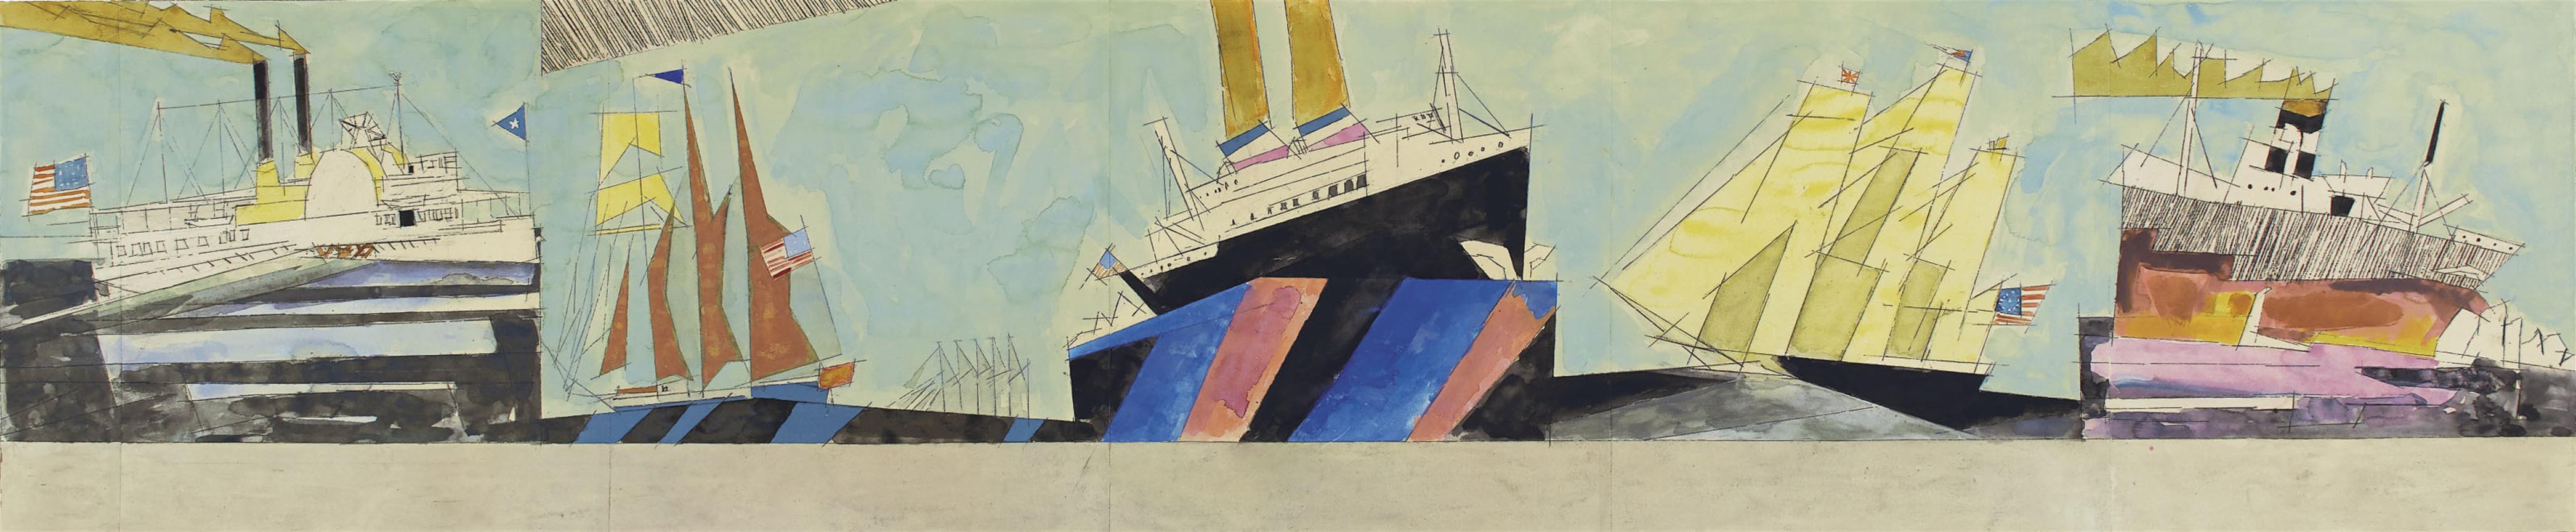 Lyonel Feininger-American Navigation (Design For Mural, Marine Transportation Building, New York Worlds Fair, 1939-1940)-1938